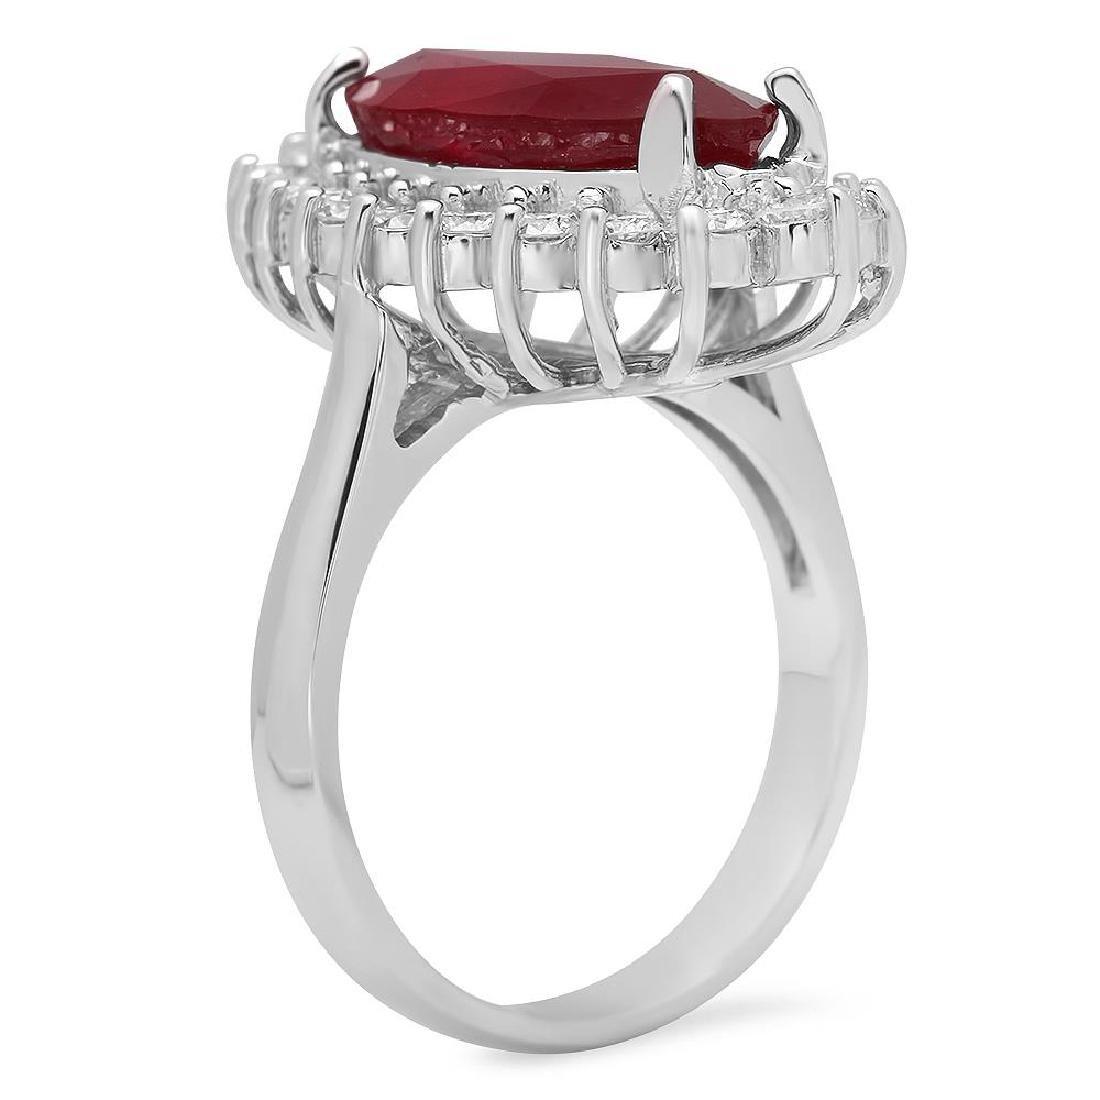 14K Gold 8.09ct Ruby 1.45ct Diamond Ring - 2